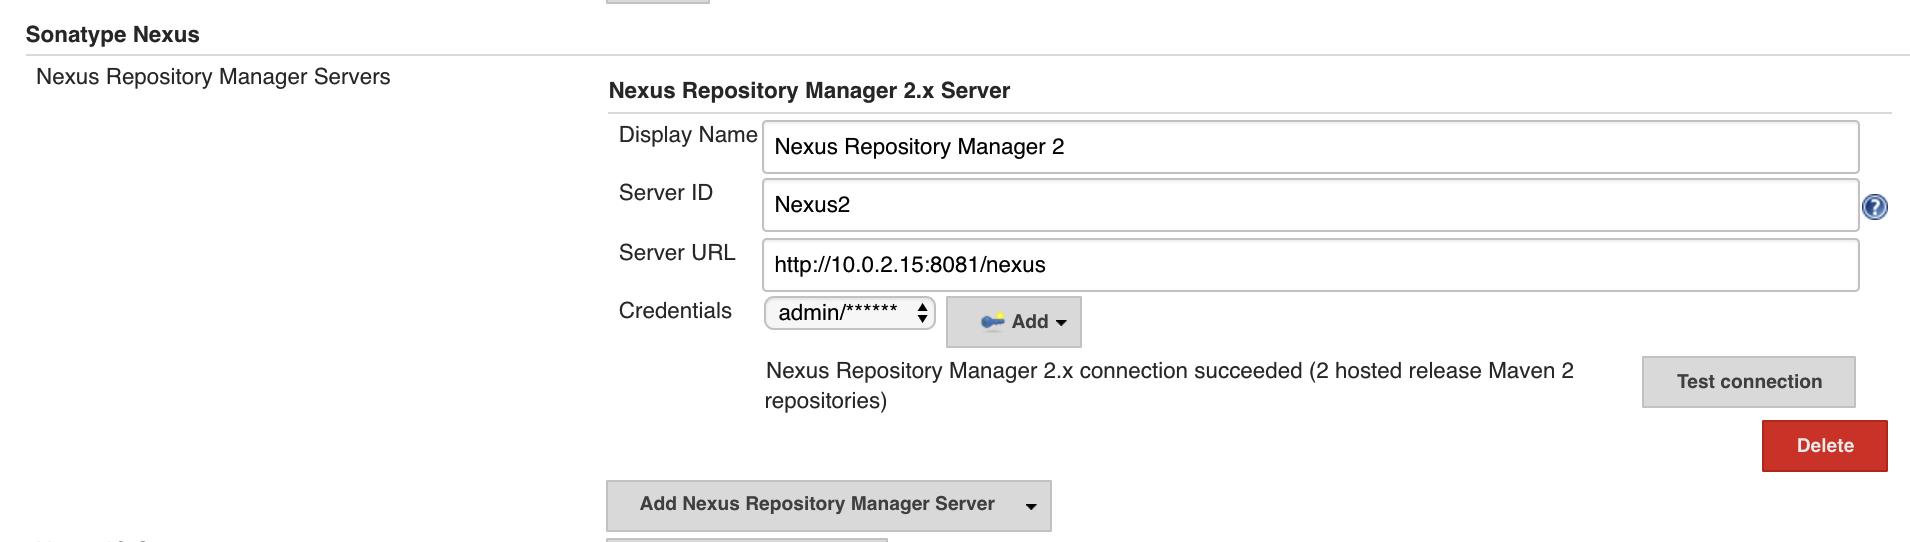 JENKINS-46136] Nexus Platform plugin fail to connect to the